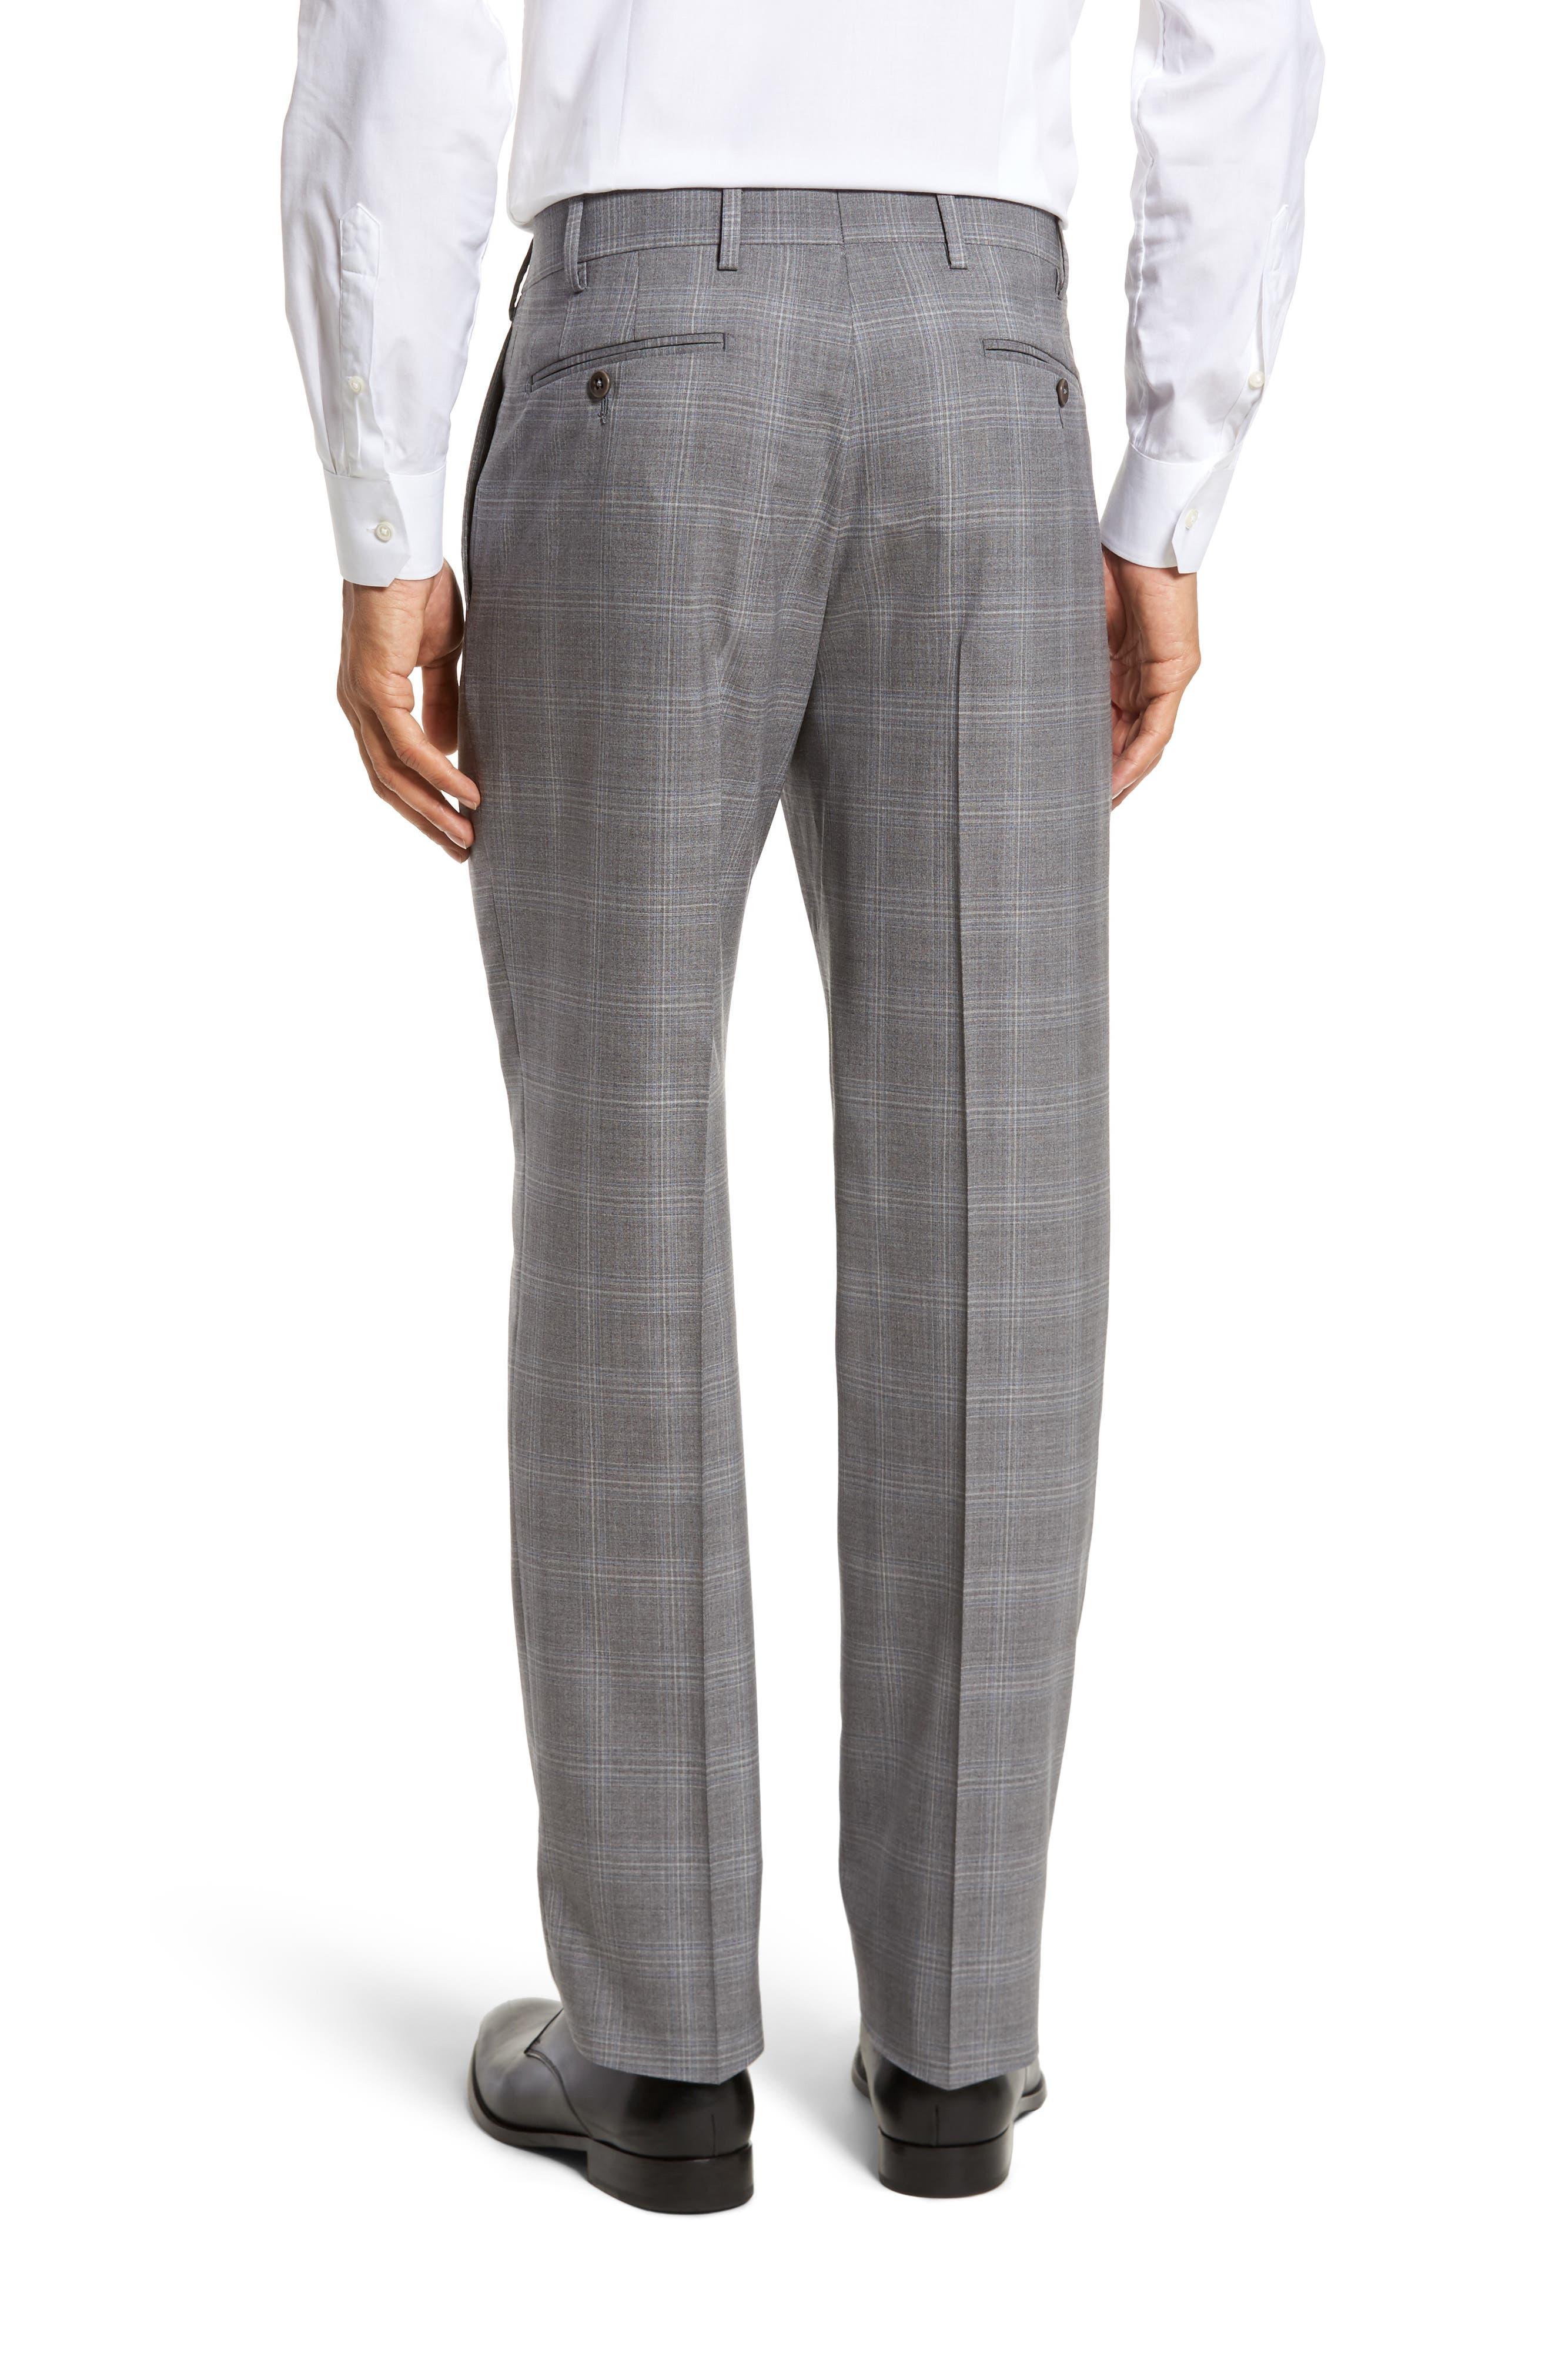 Devon Flat Front Plaid Wool Trousers,                             Alternate thumbnail 2, color,                             Light Grey